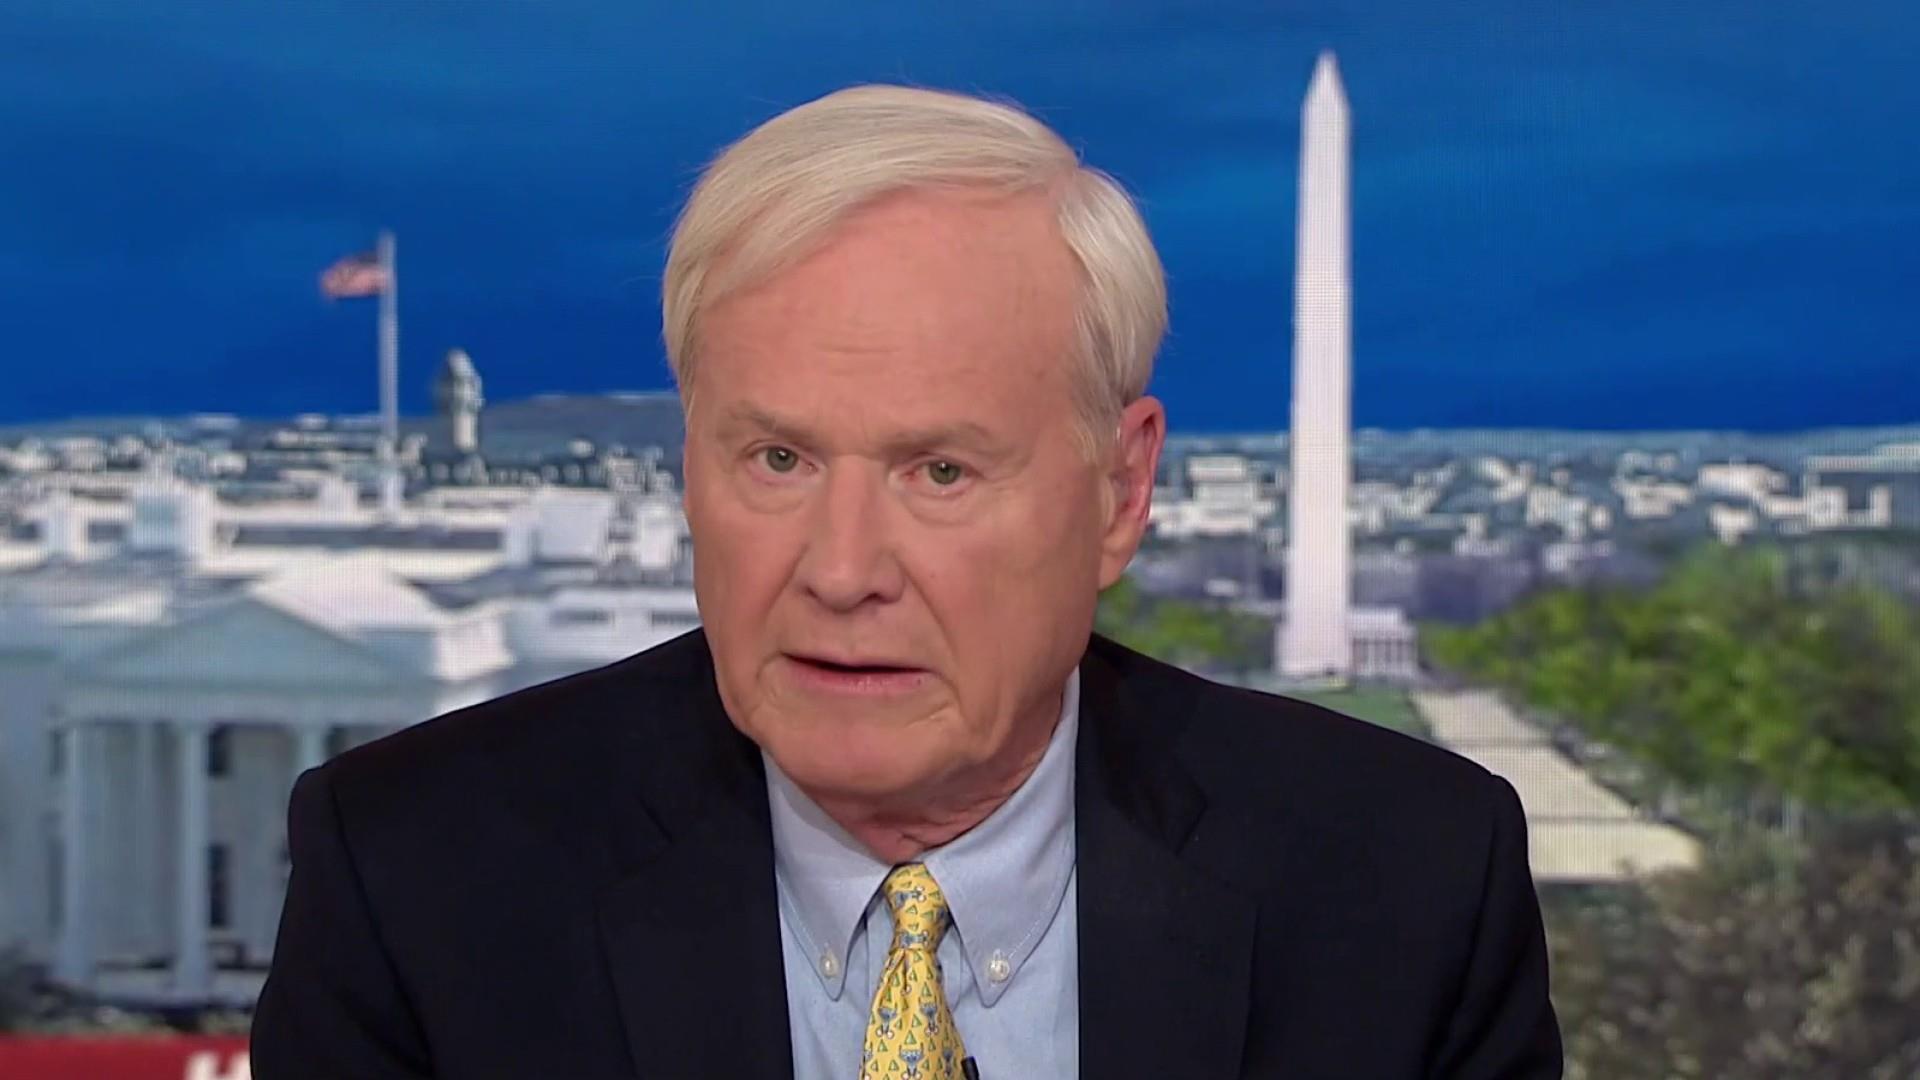 Chris Matthews: Pennsylvania will be key in 2020